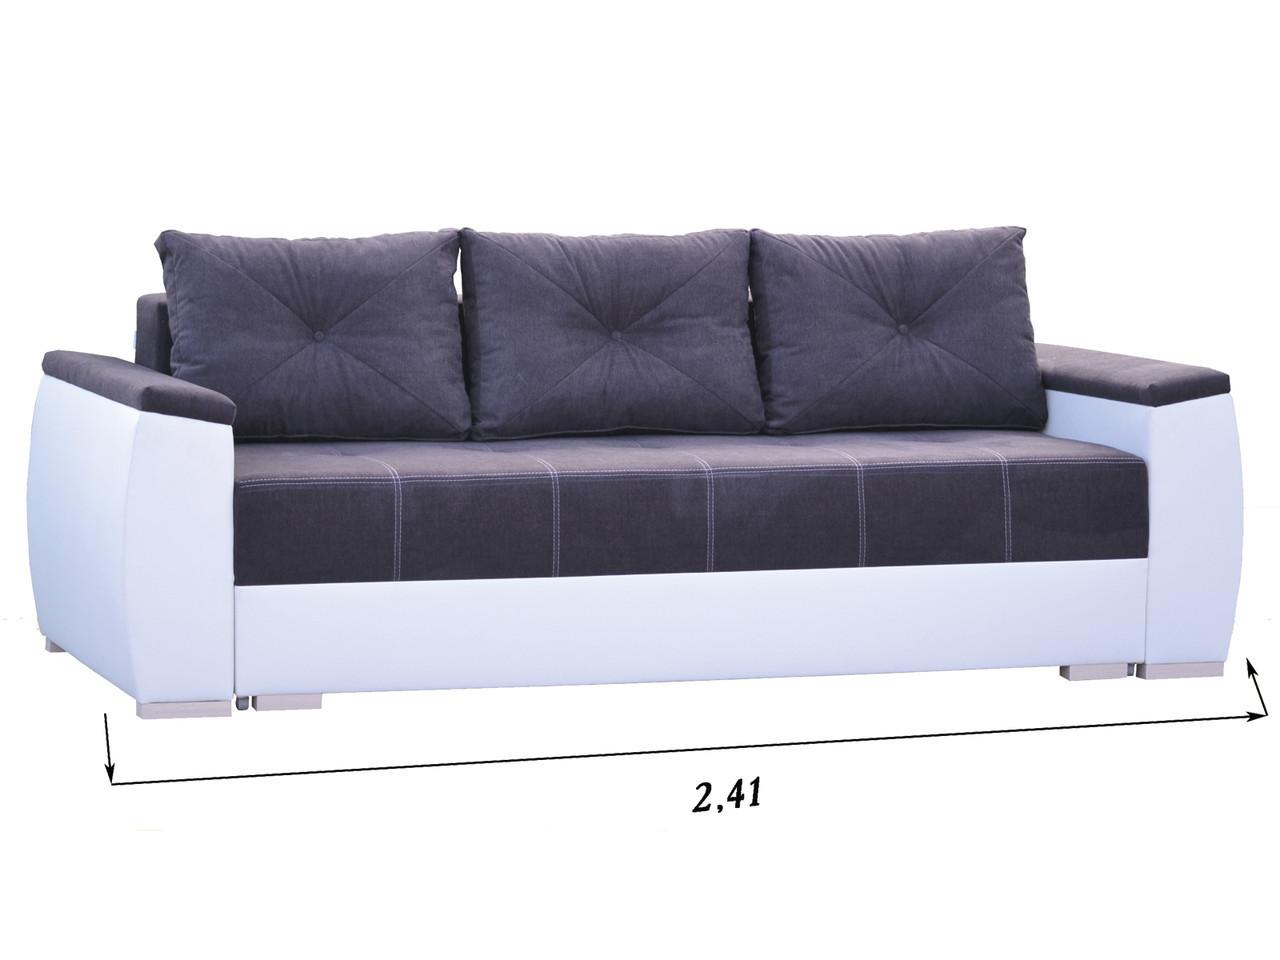 Мягкий диван Мюнхен